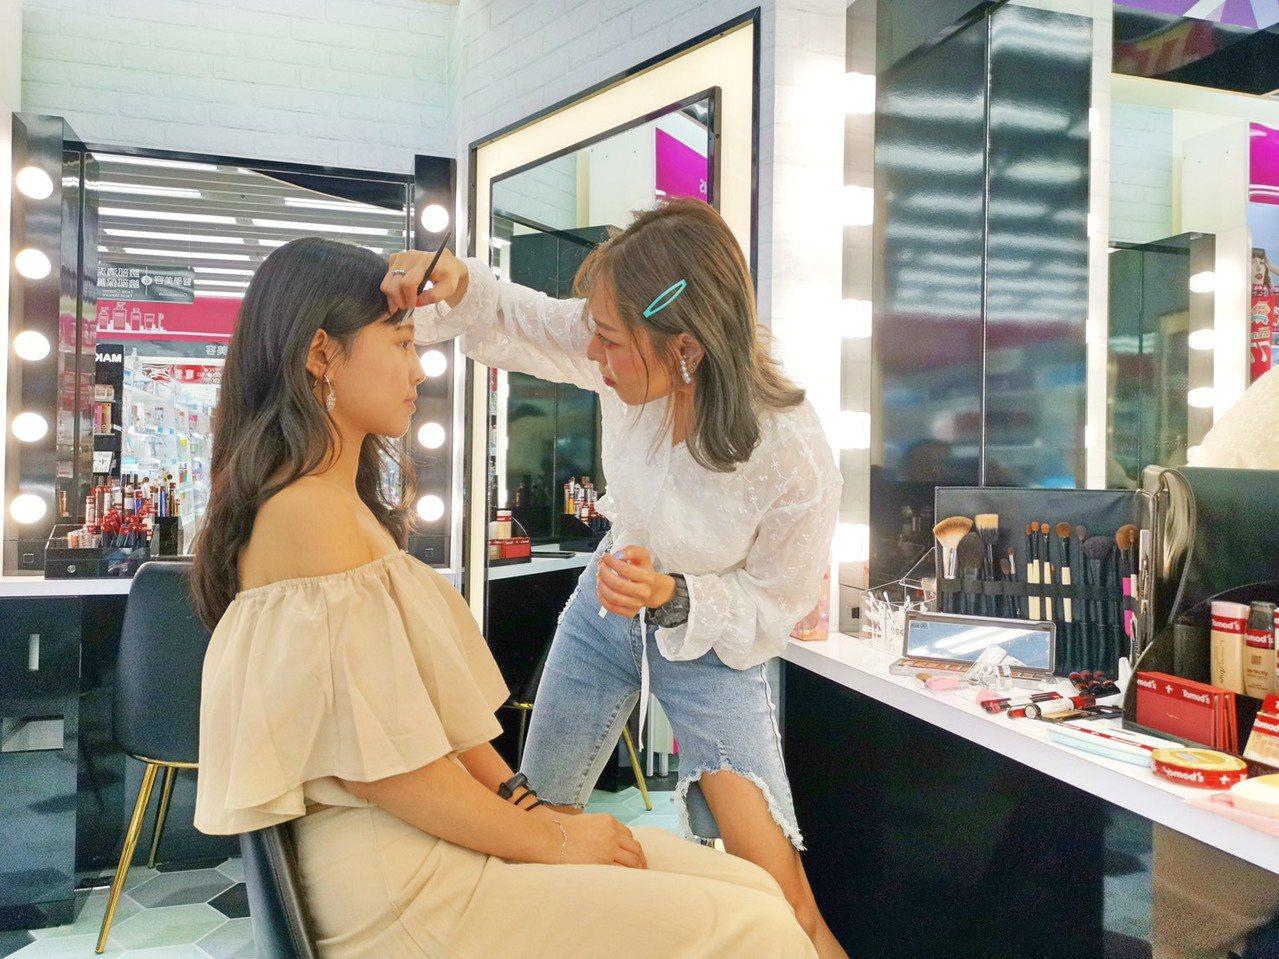 Tomod's台北ATT 4 FUN門市獨家設置Make up bar試妝區,並...